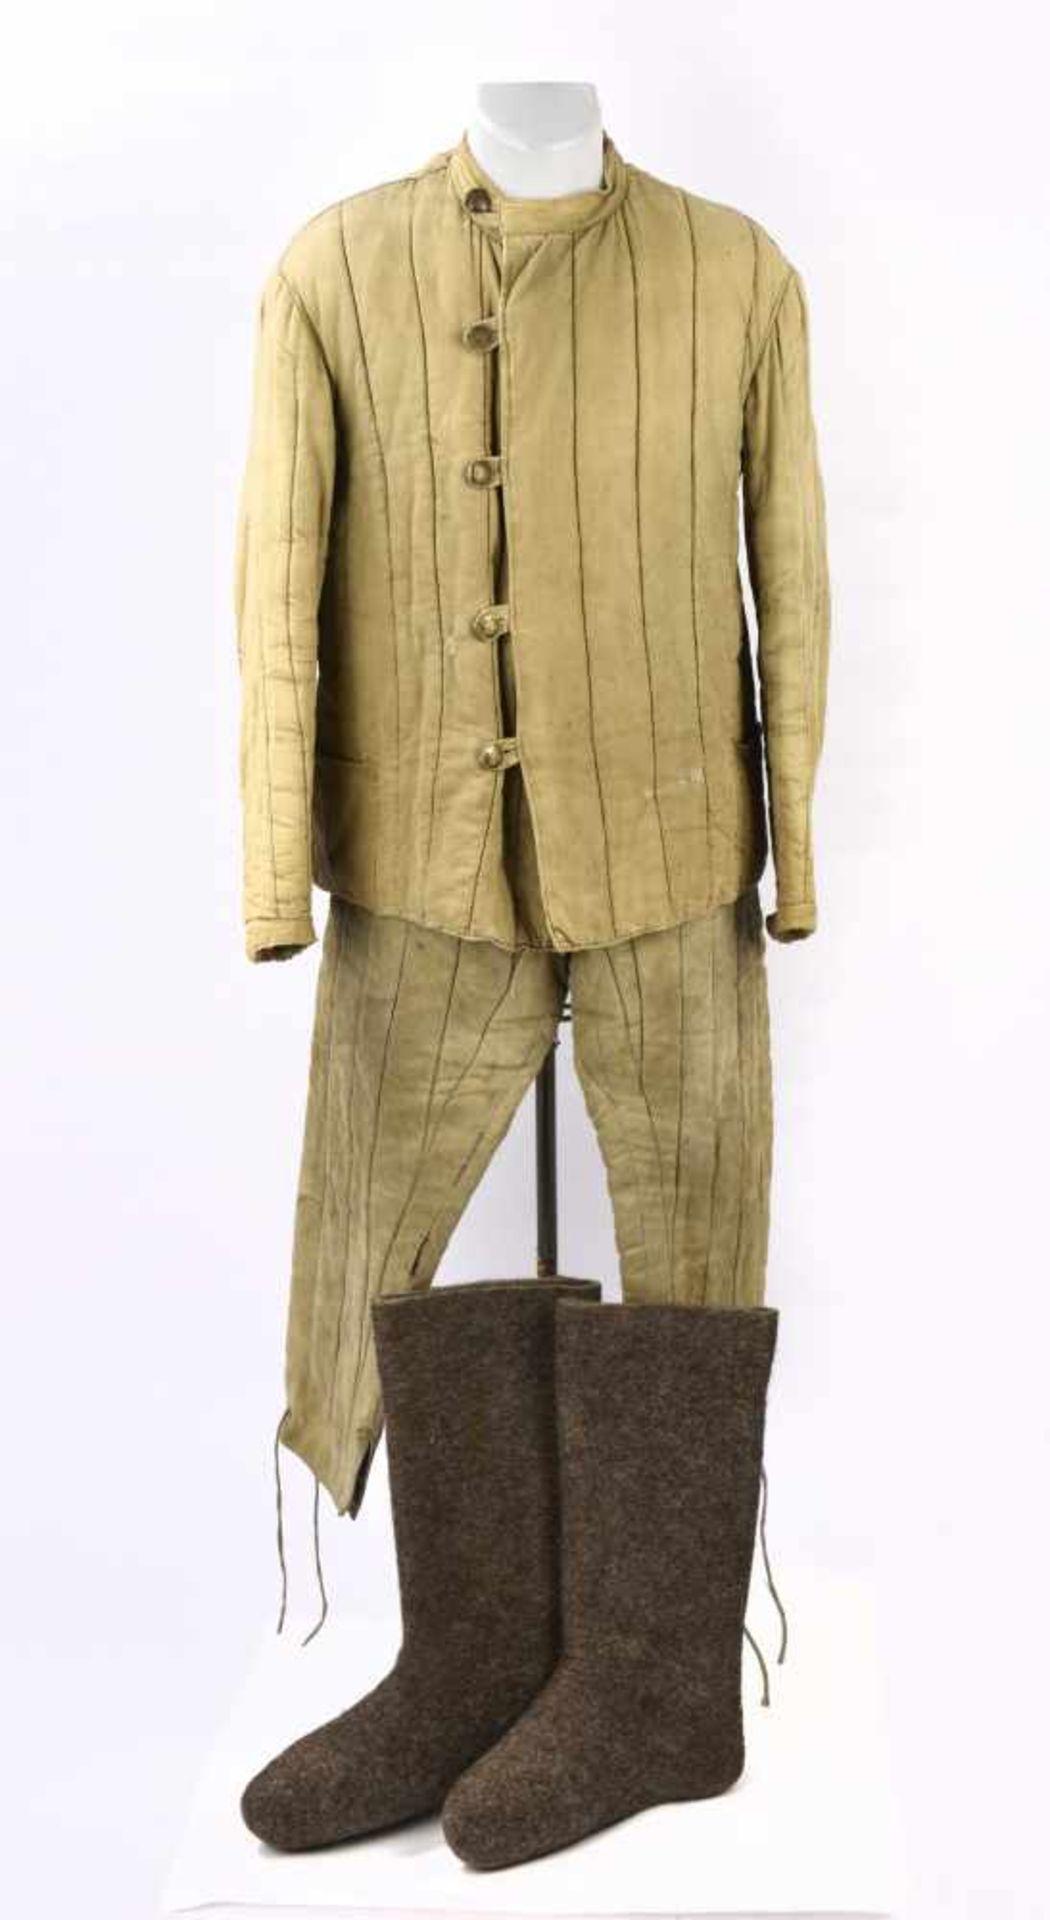 Ensemble matelassé comprenant la veste Telogreyka et le pantalon Ensemble homogène trouvé en